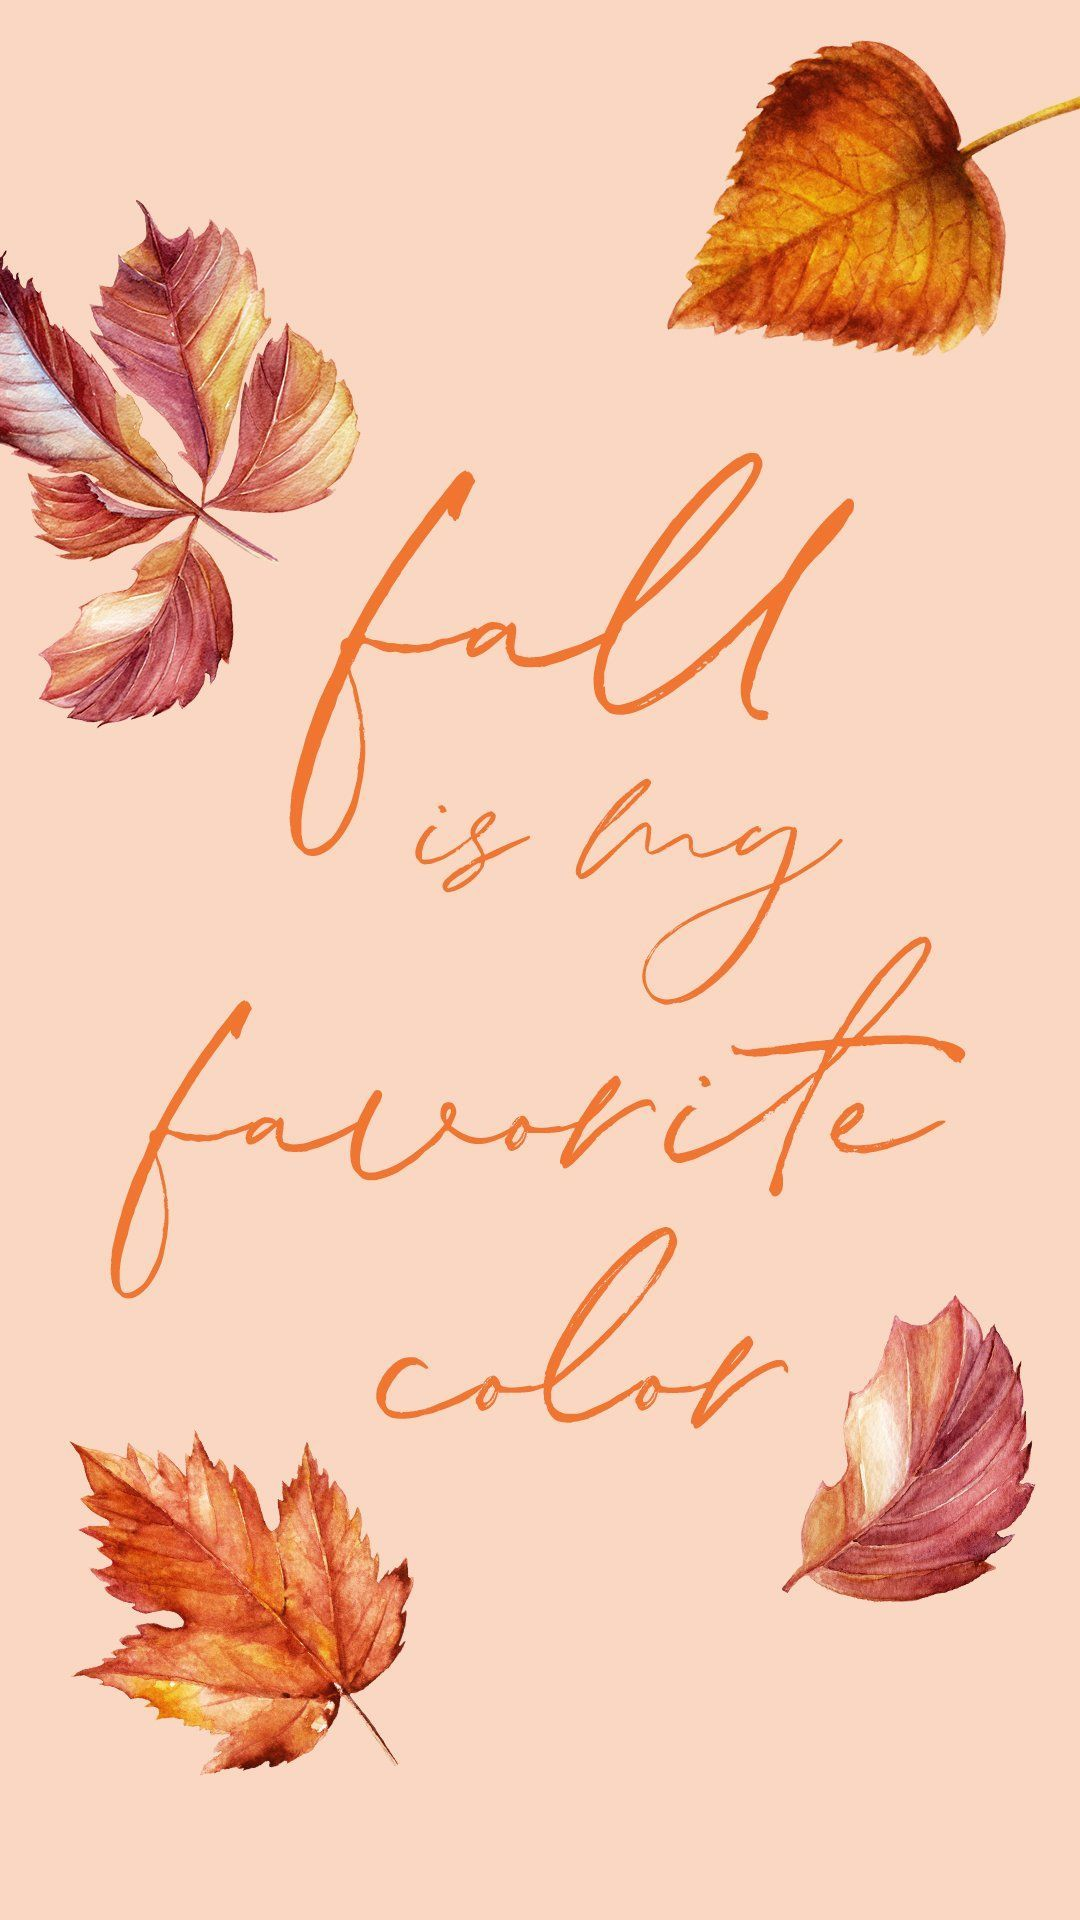 Fall Is My Favorite Color Free Wallpaper Iphonewallpaperfall Freefallwallpaper Fallbackgrounds Fall Wallpaper Iphone Wallpaper Fall Cute Fall Wallpaper